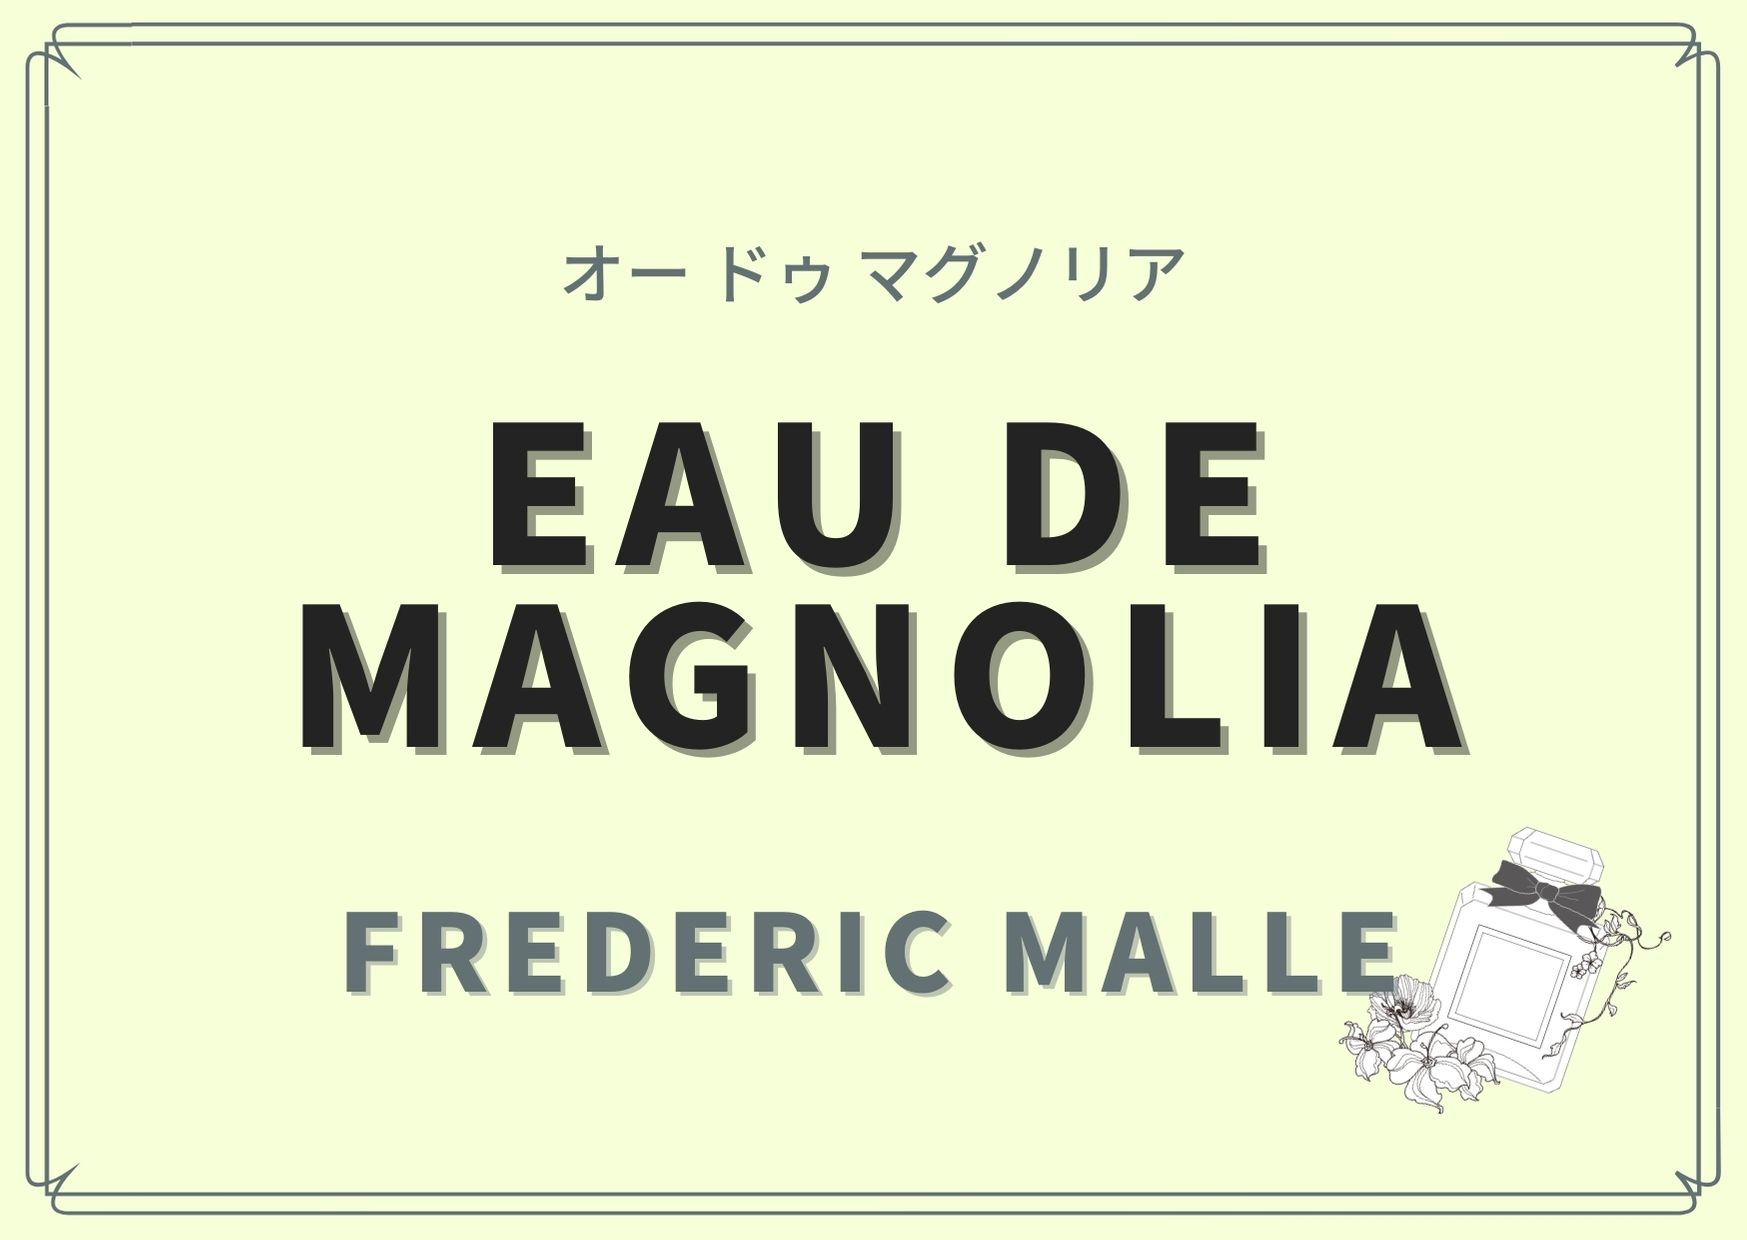 EAU DE MAGNOLIA(オー ドゥ マグノリア)/FREDERIC MALLE(フレデリック マル)